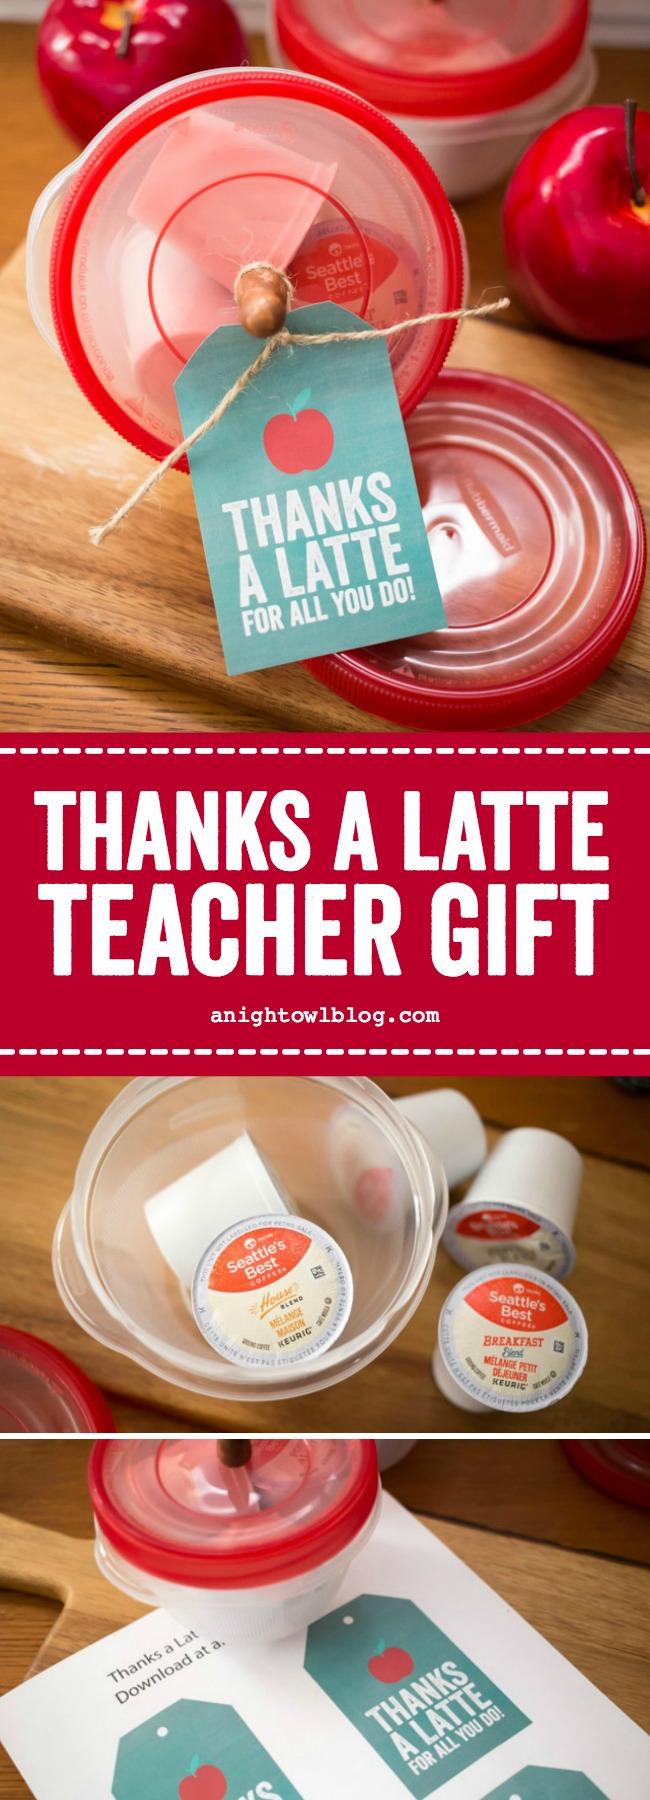 Thanks a Latte Teacher Gift